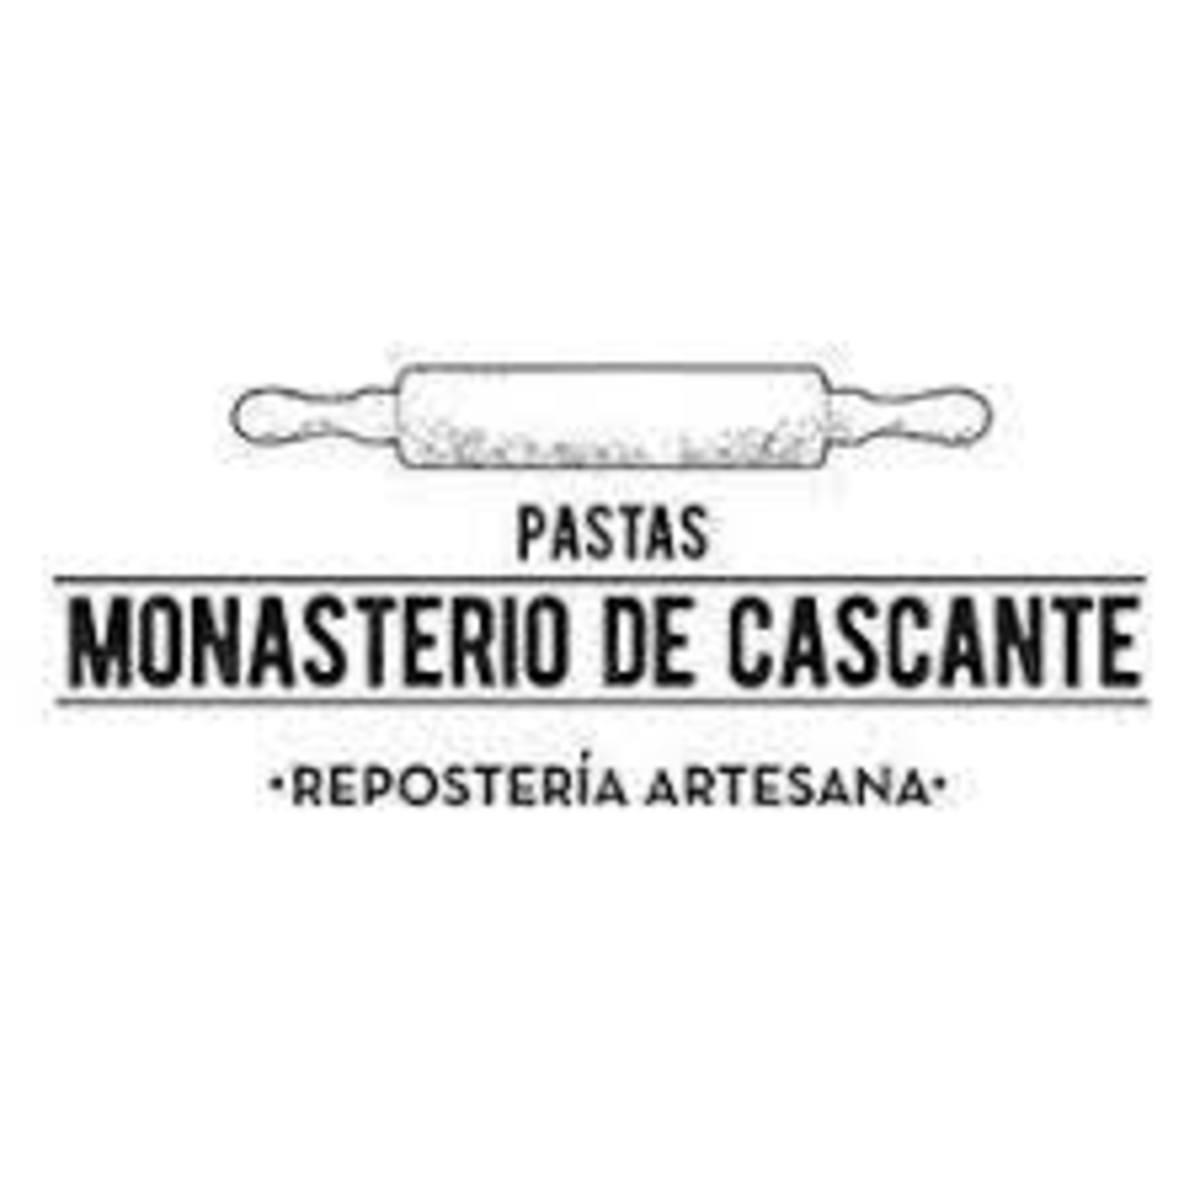 Tejas Monasterio de Cascante